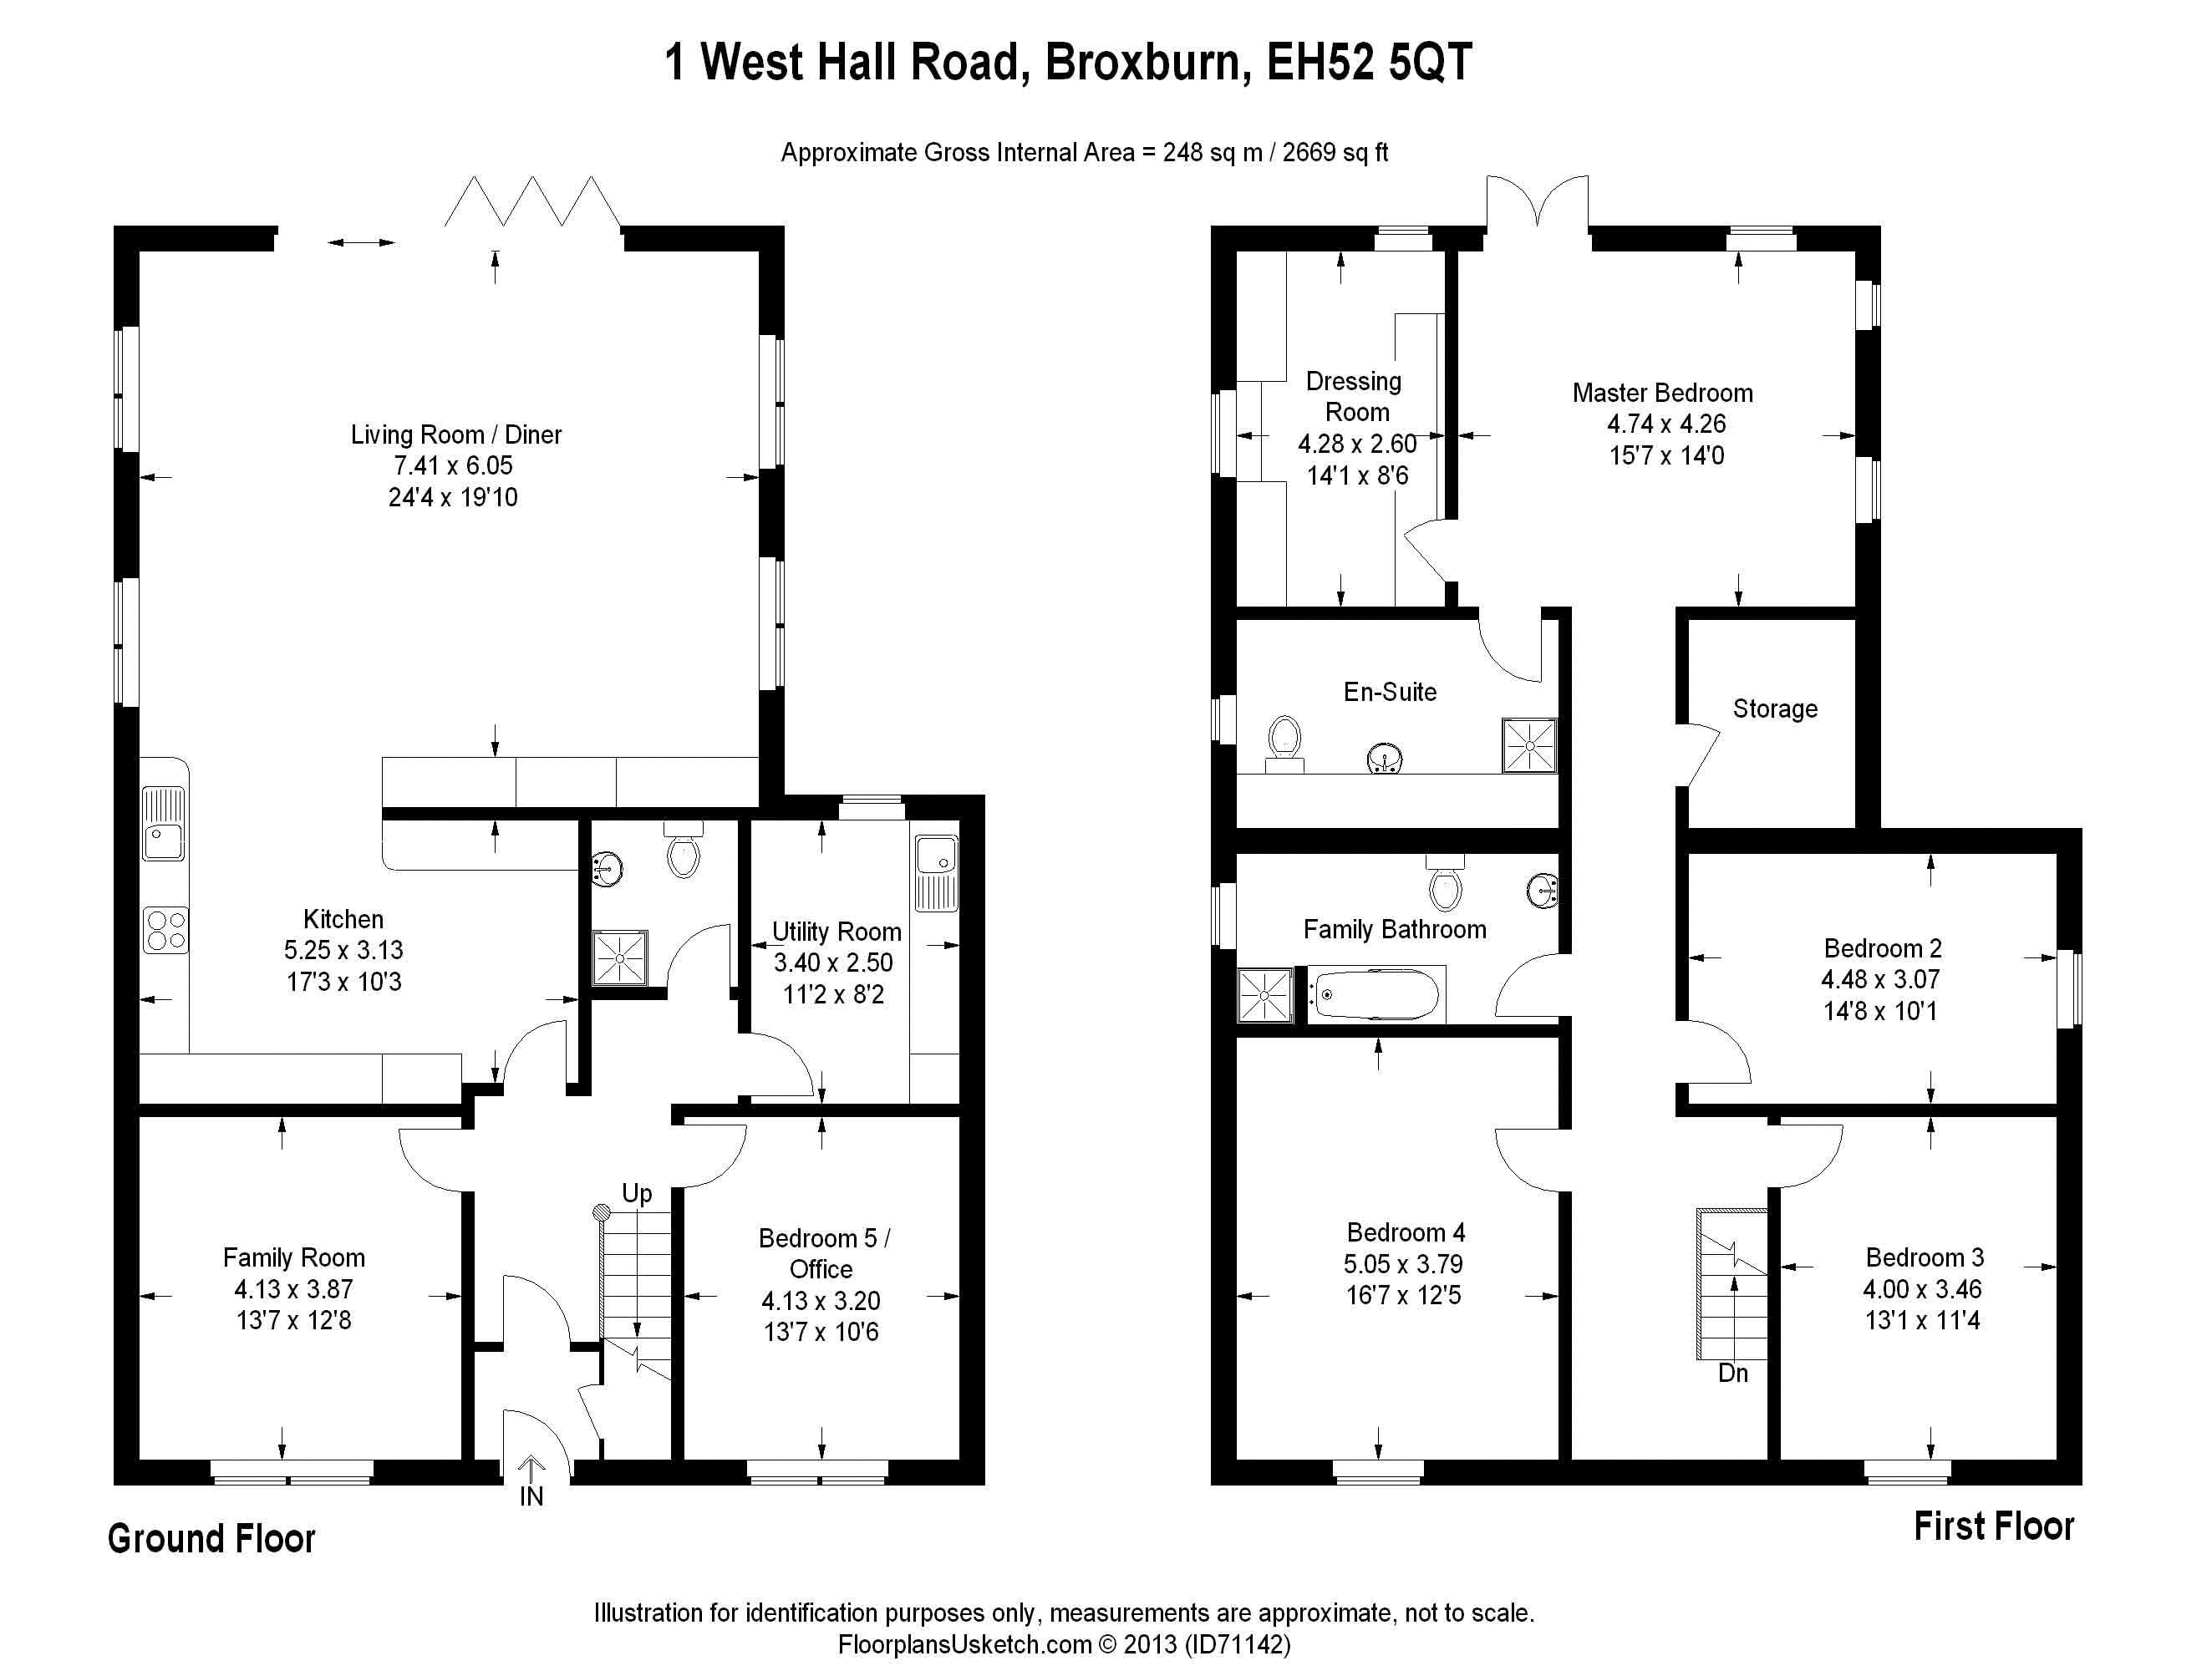 1 WHR Floor Plan